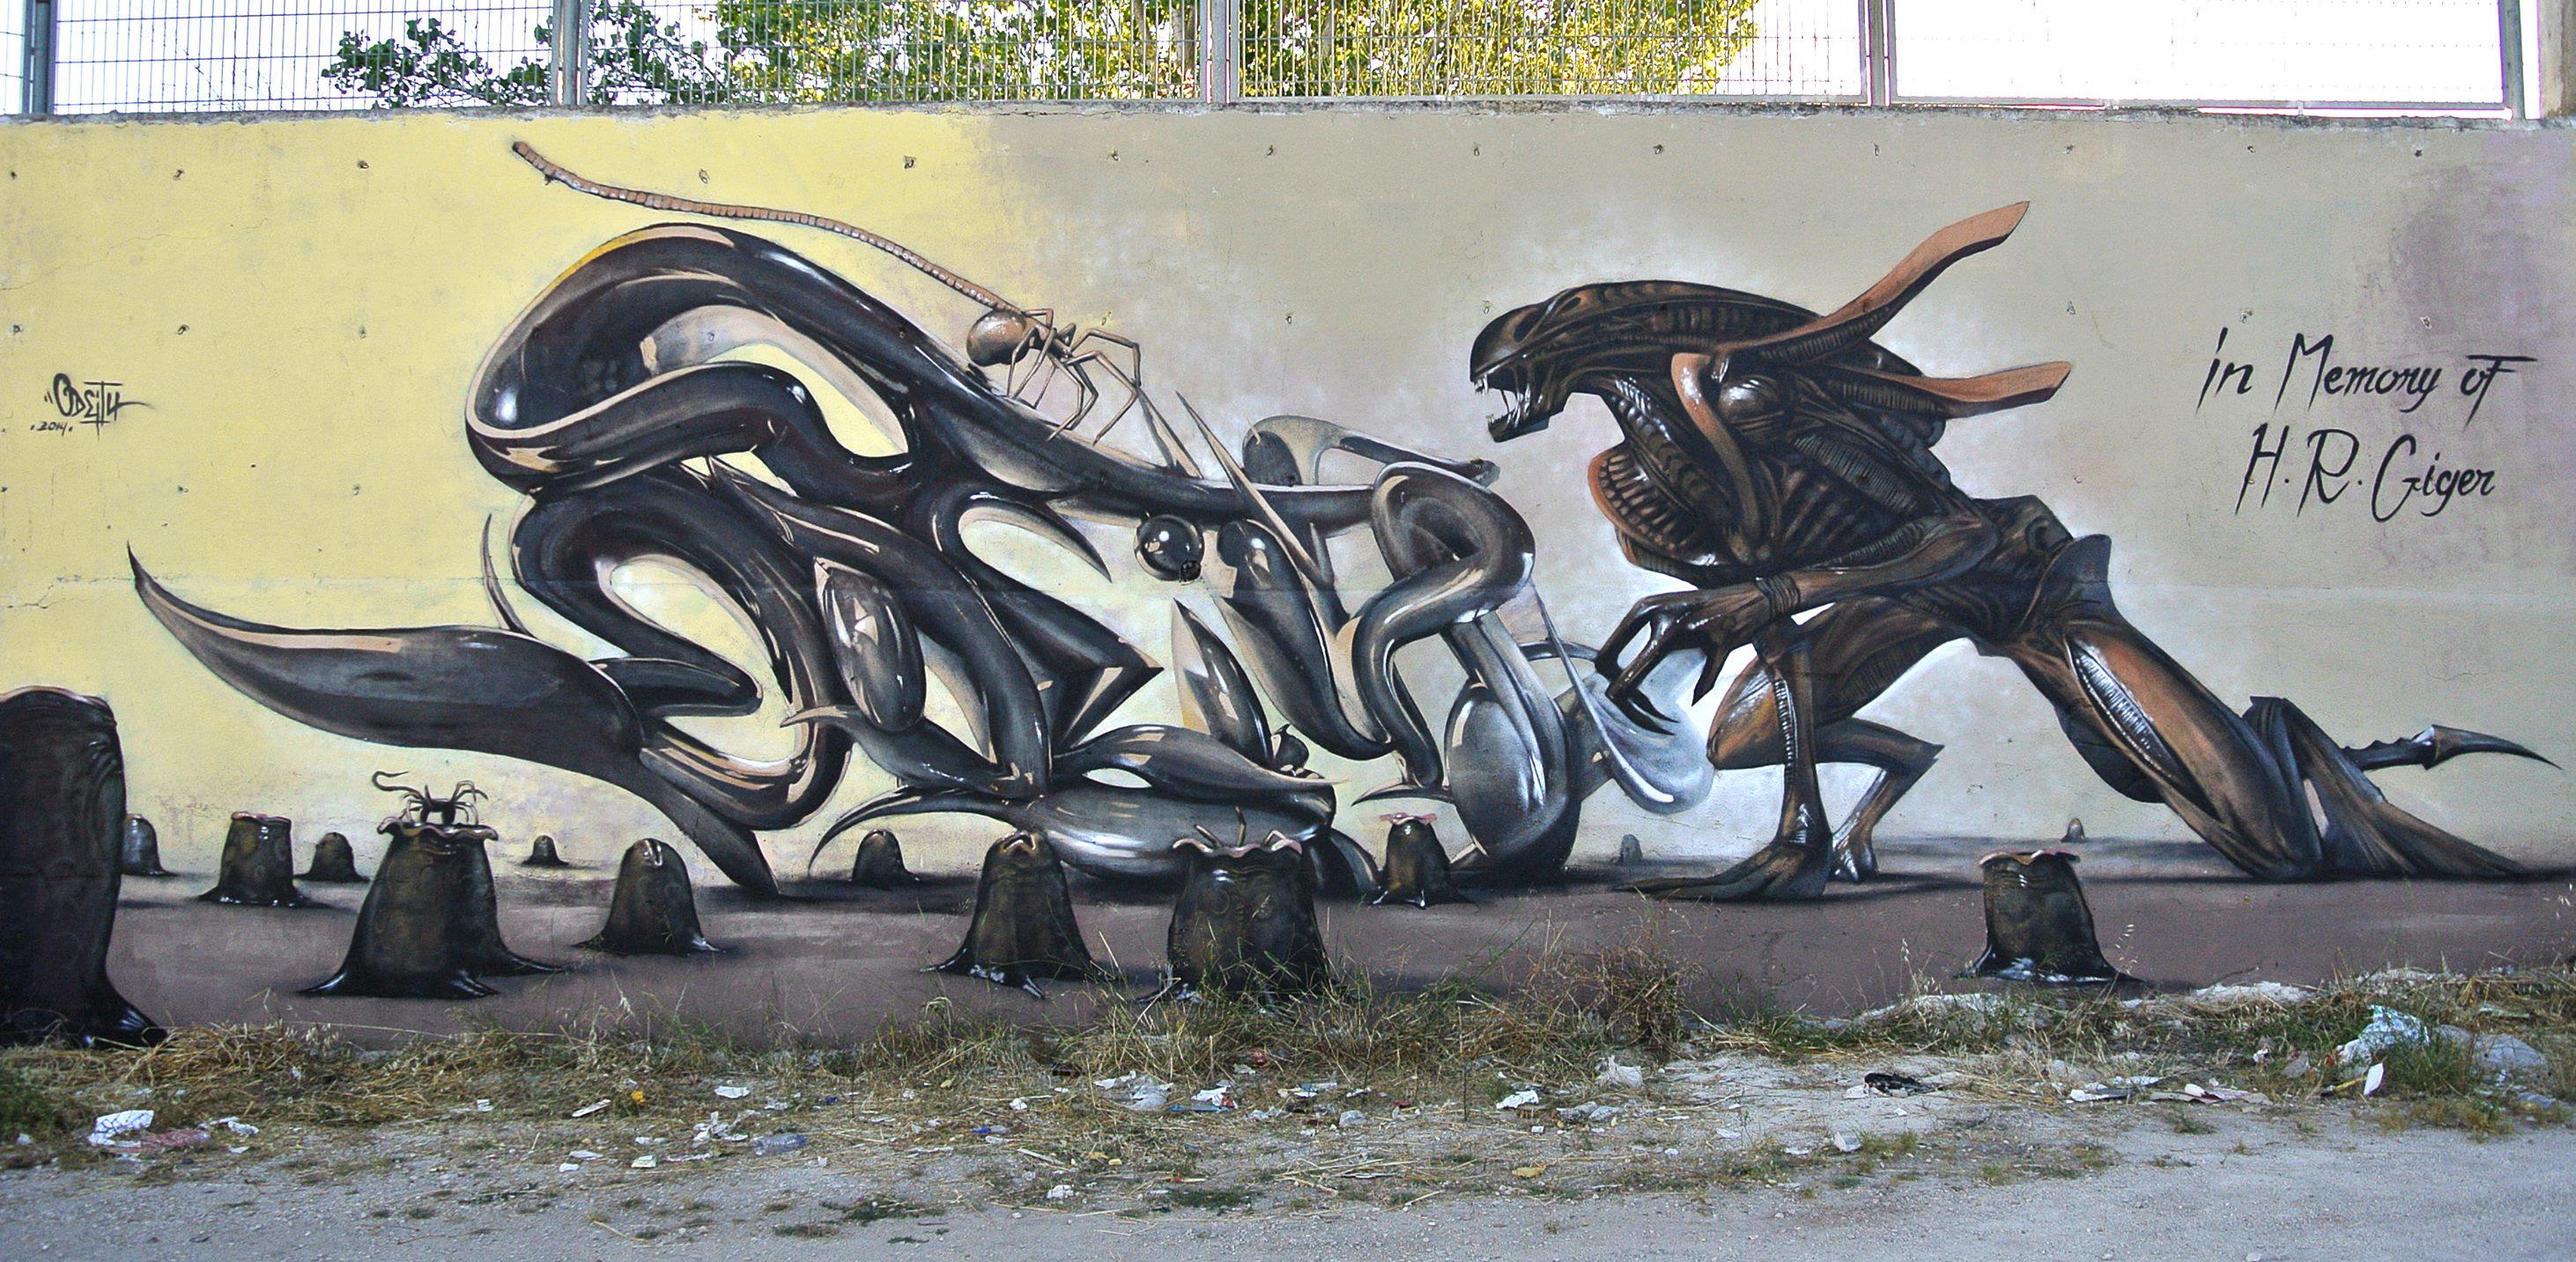 odeith-hr-giger-graffiti